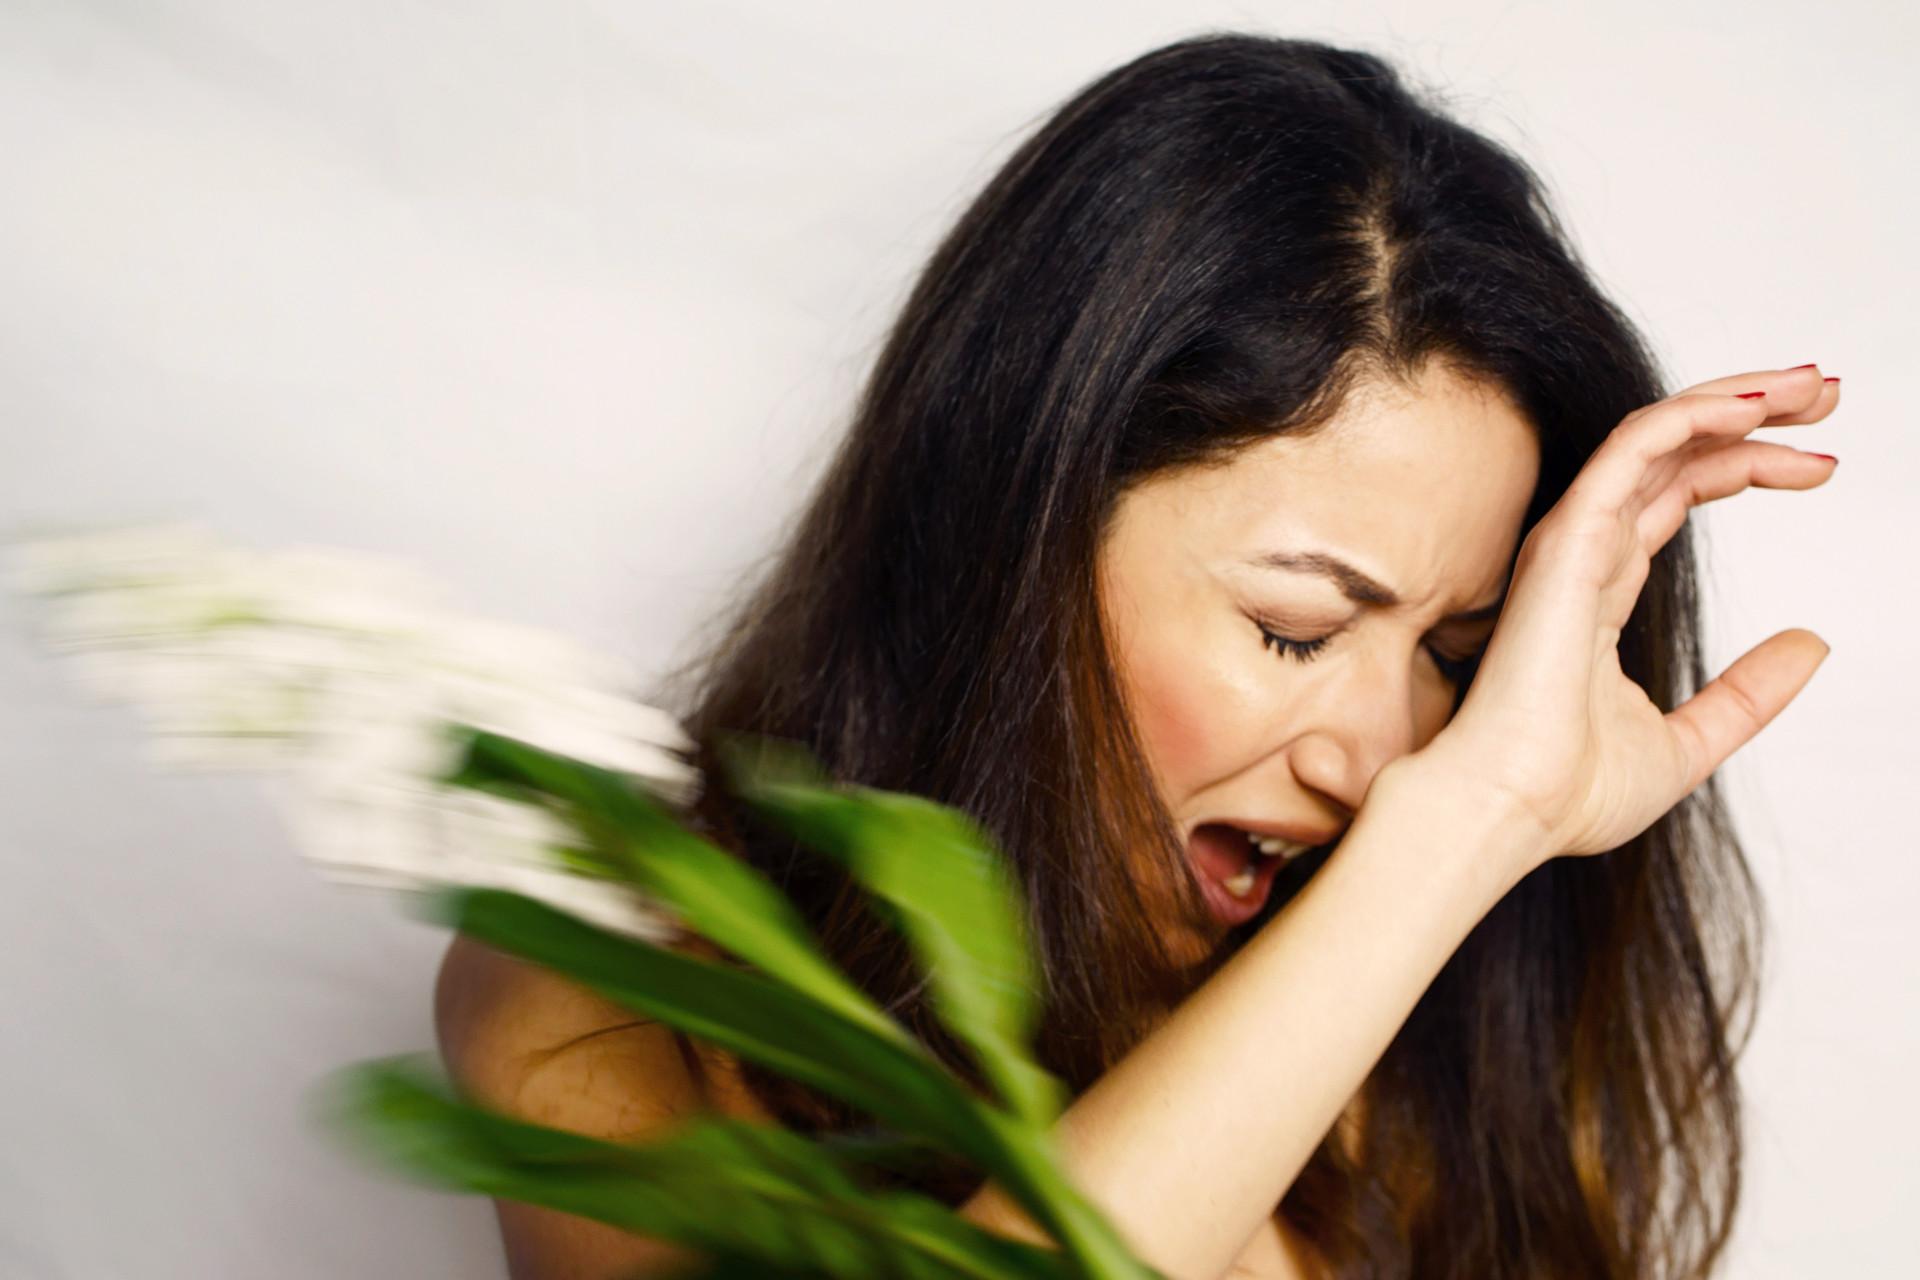 Carola slapped by flowers